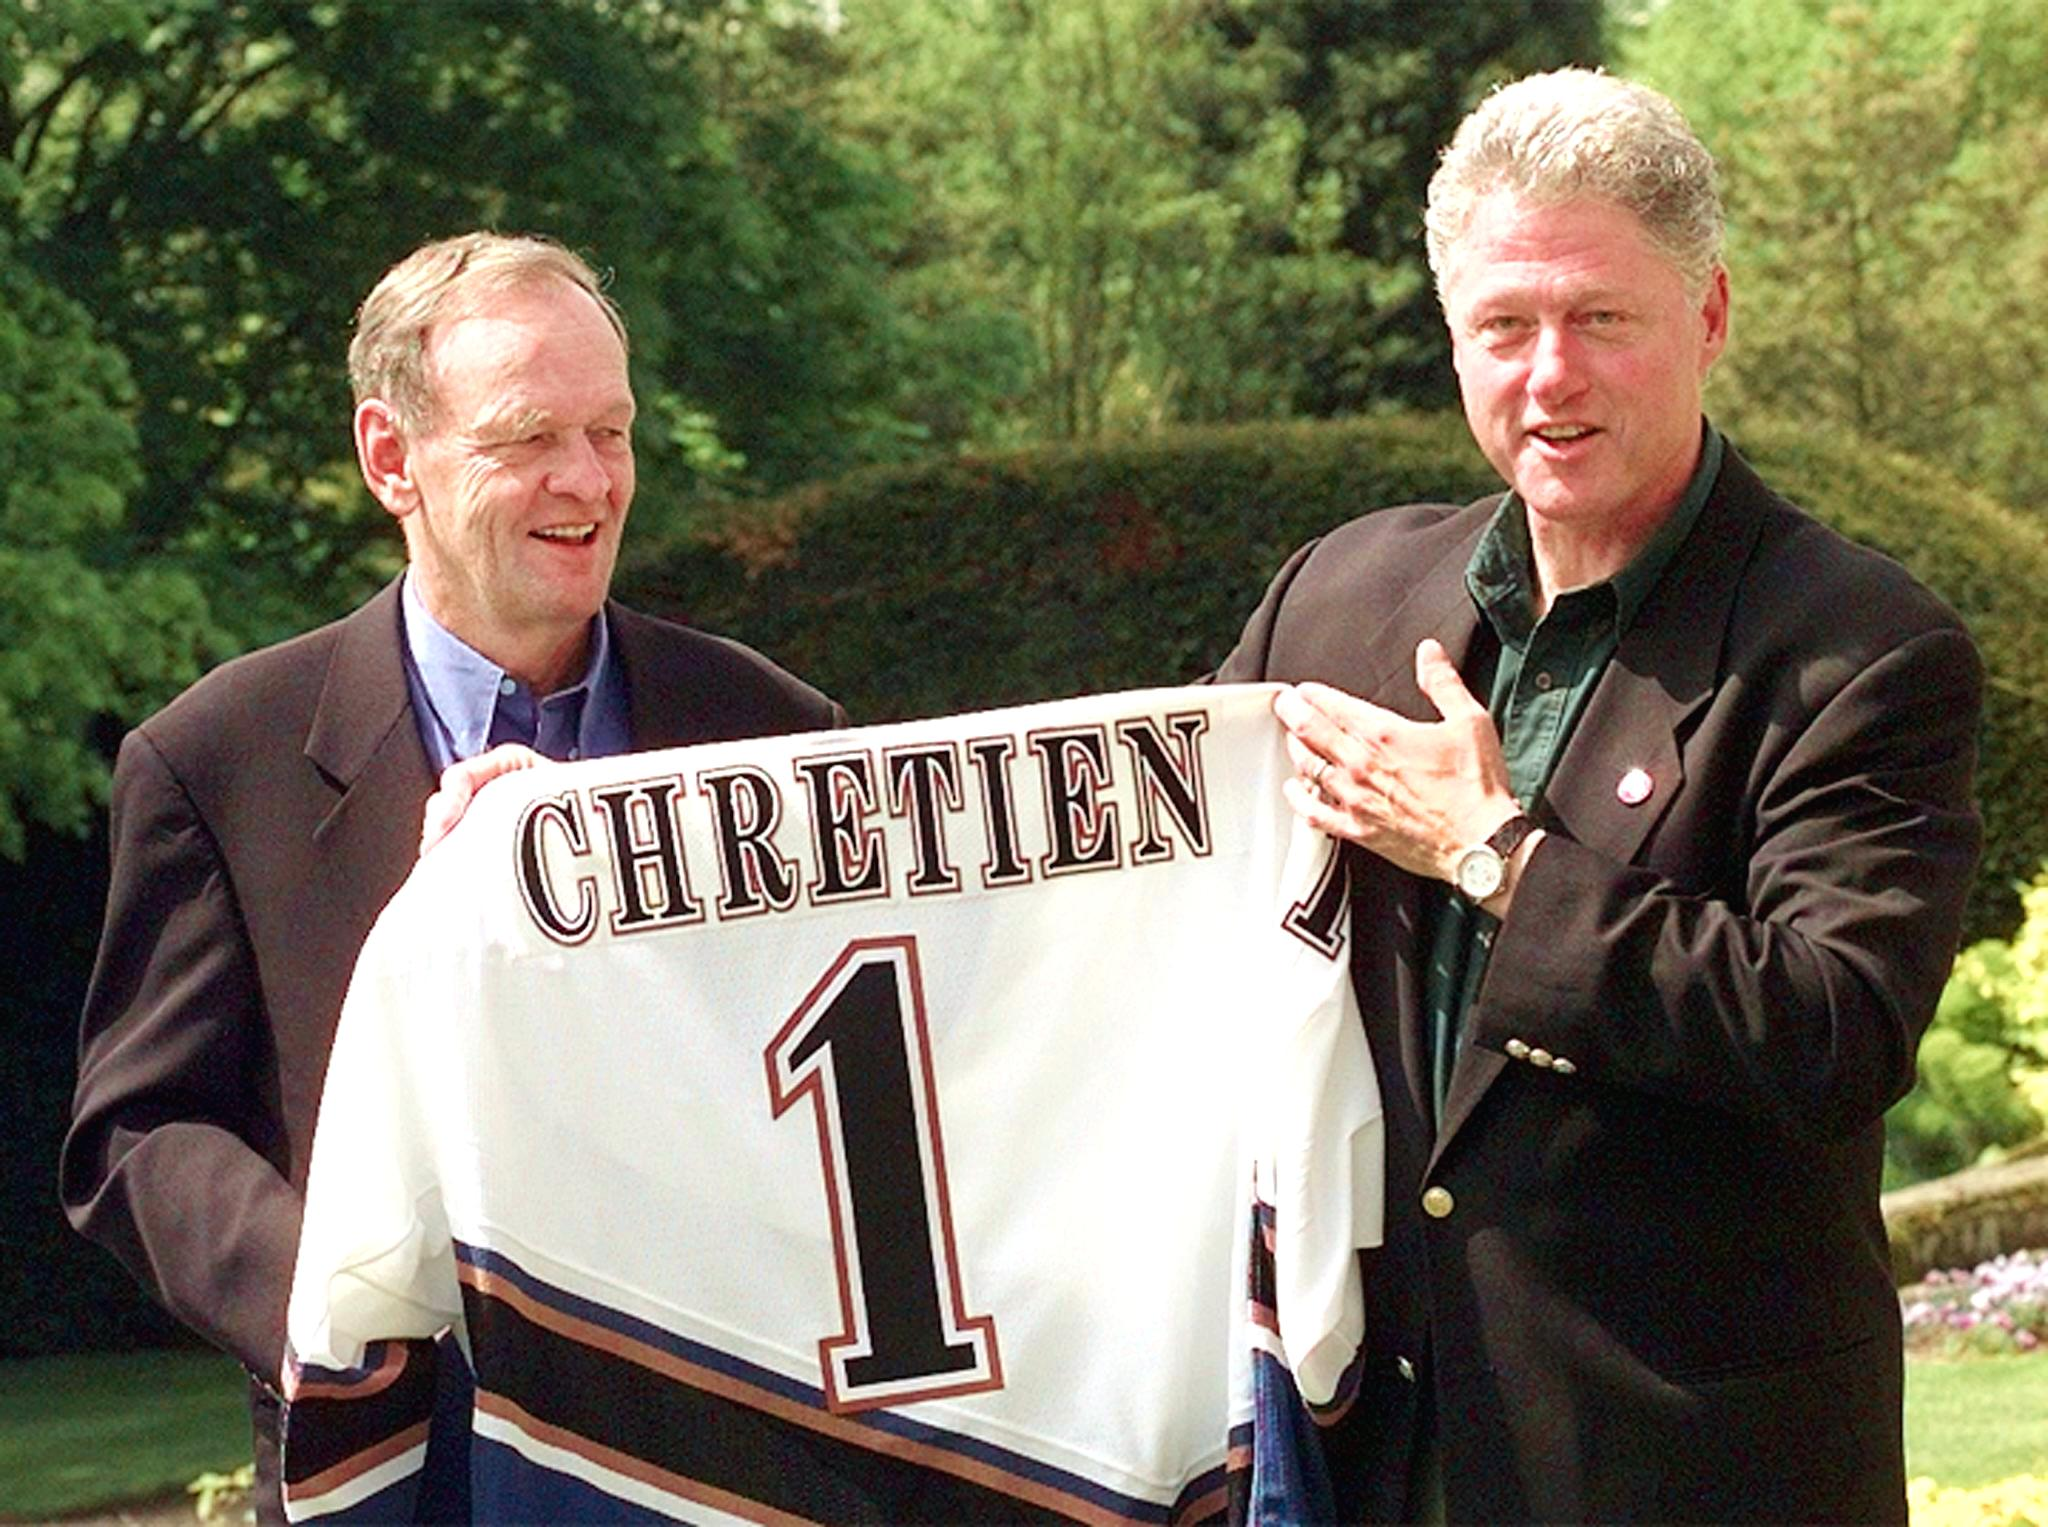 US President Bill Clinton presents Canadian Prime